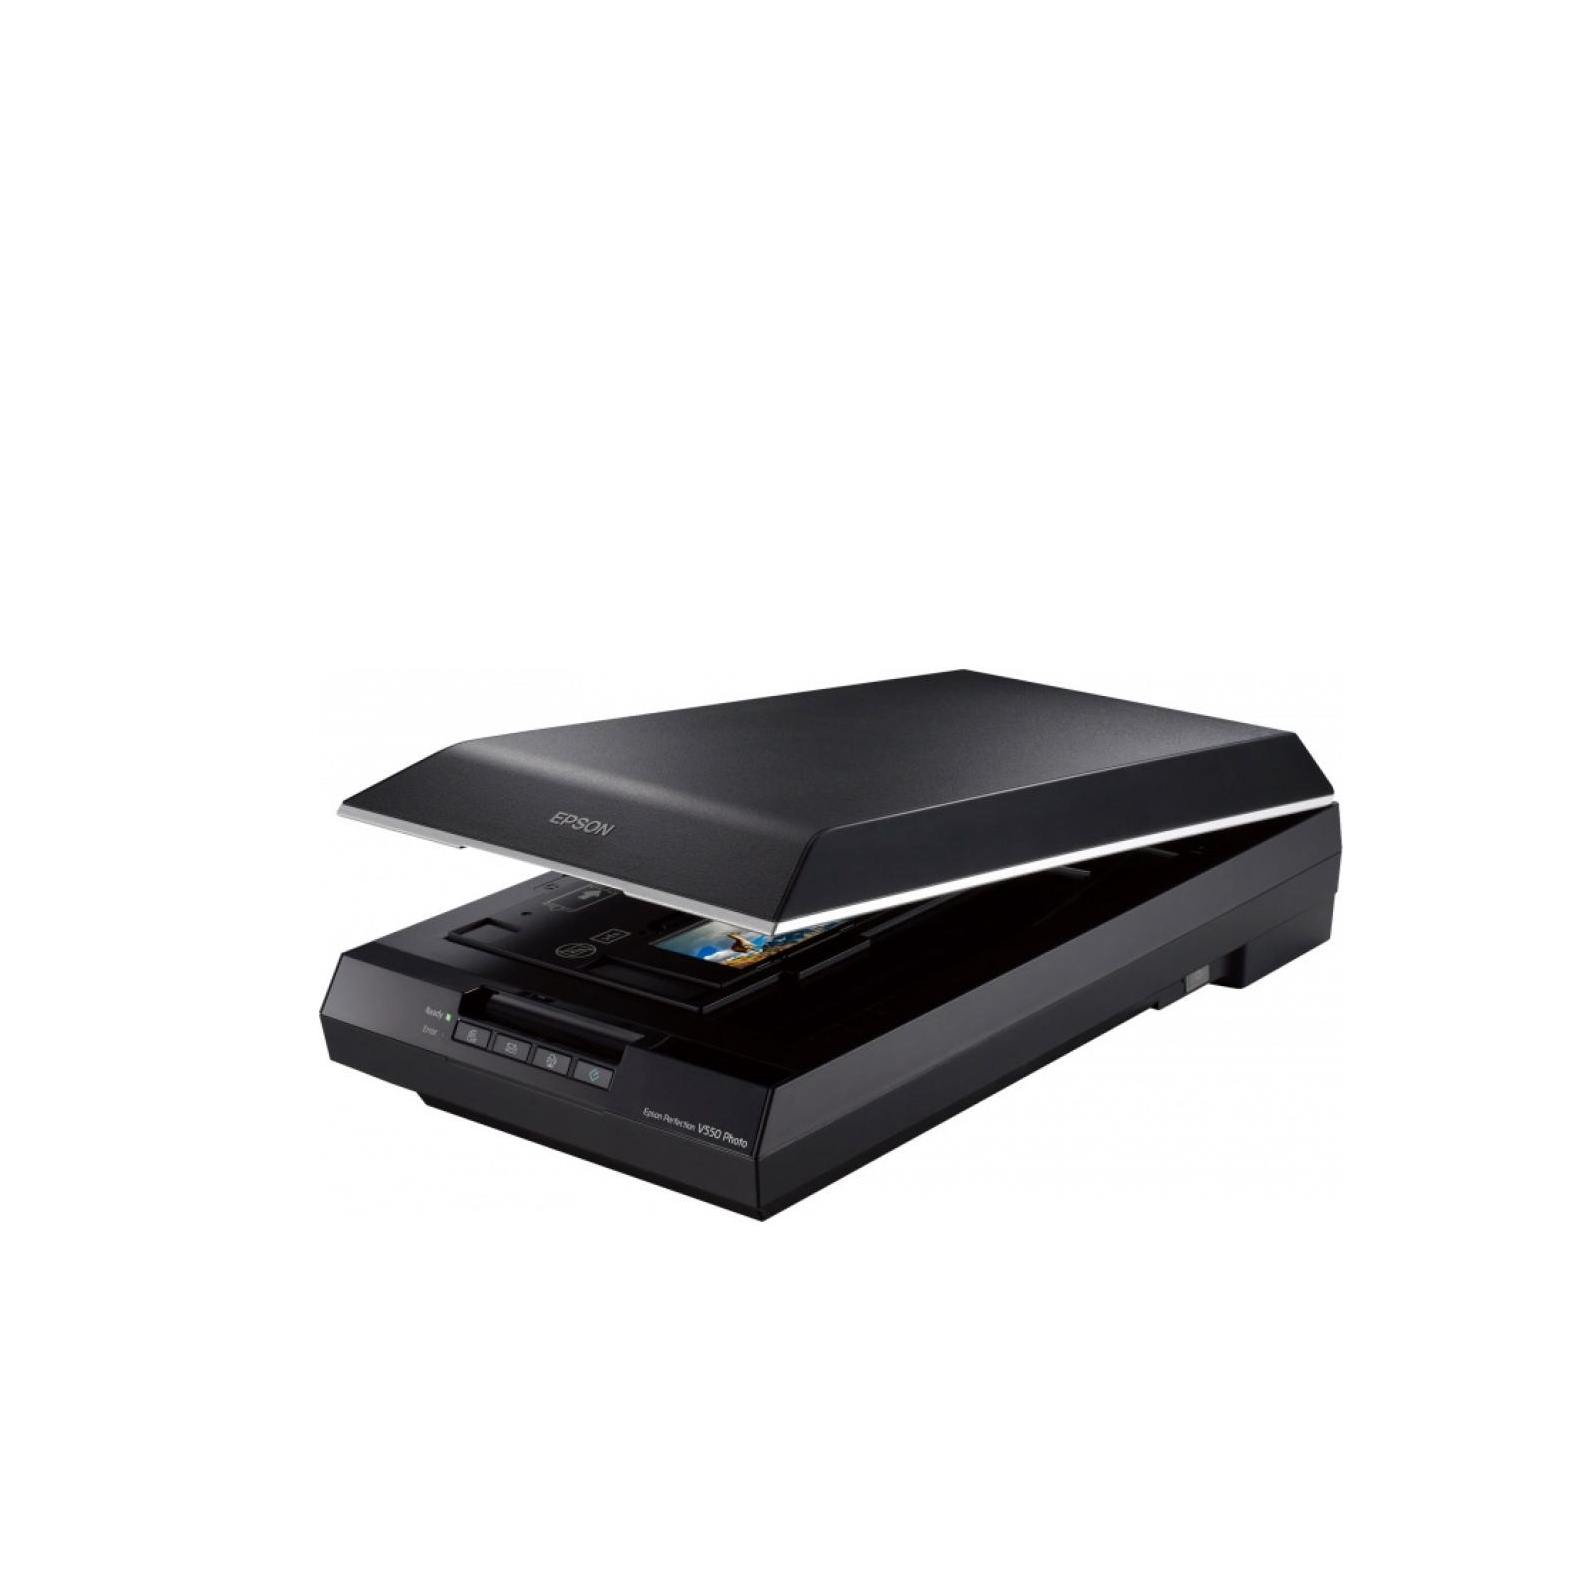 Планшетный сканер Perfection V550 Photo B11B210303